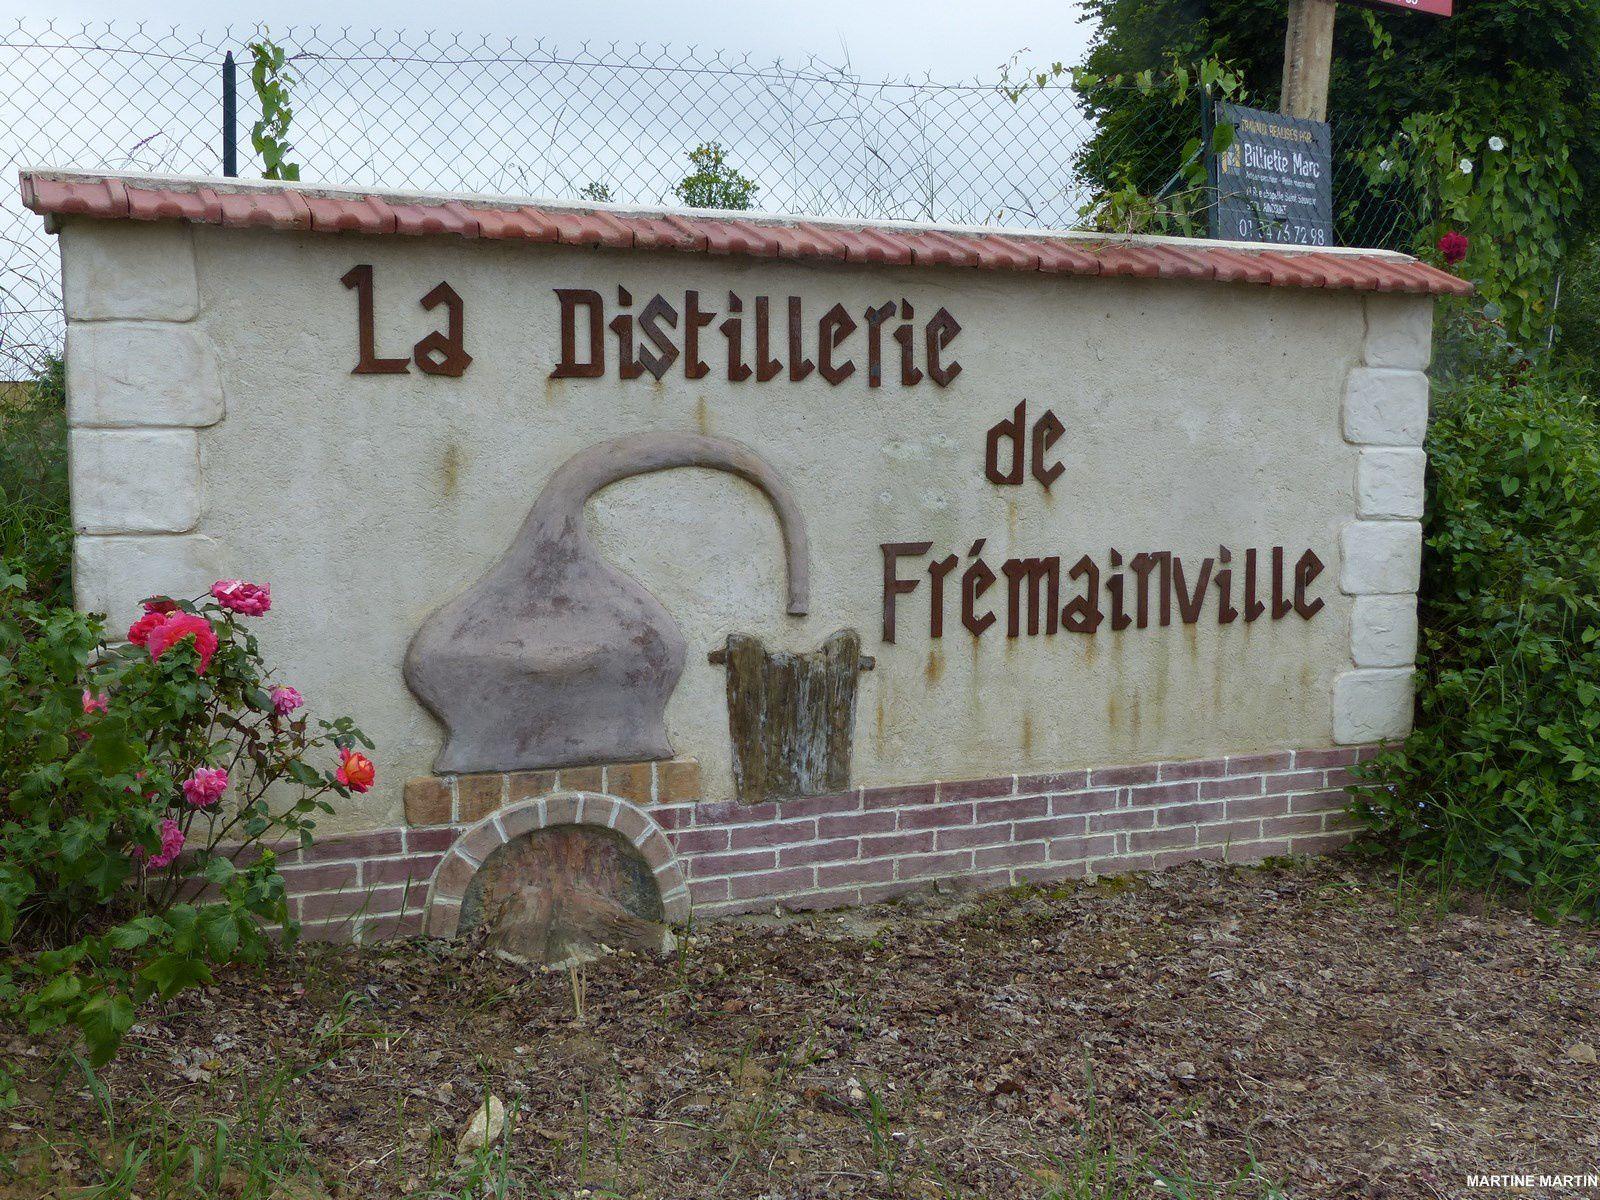 La distillerie de Fremainville (Vexin)